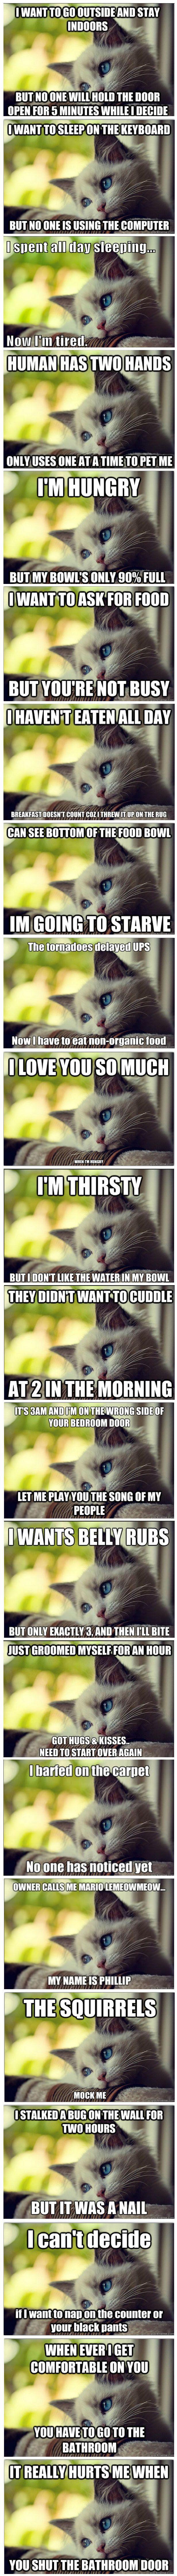 Ahh, the life of kitties!